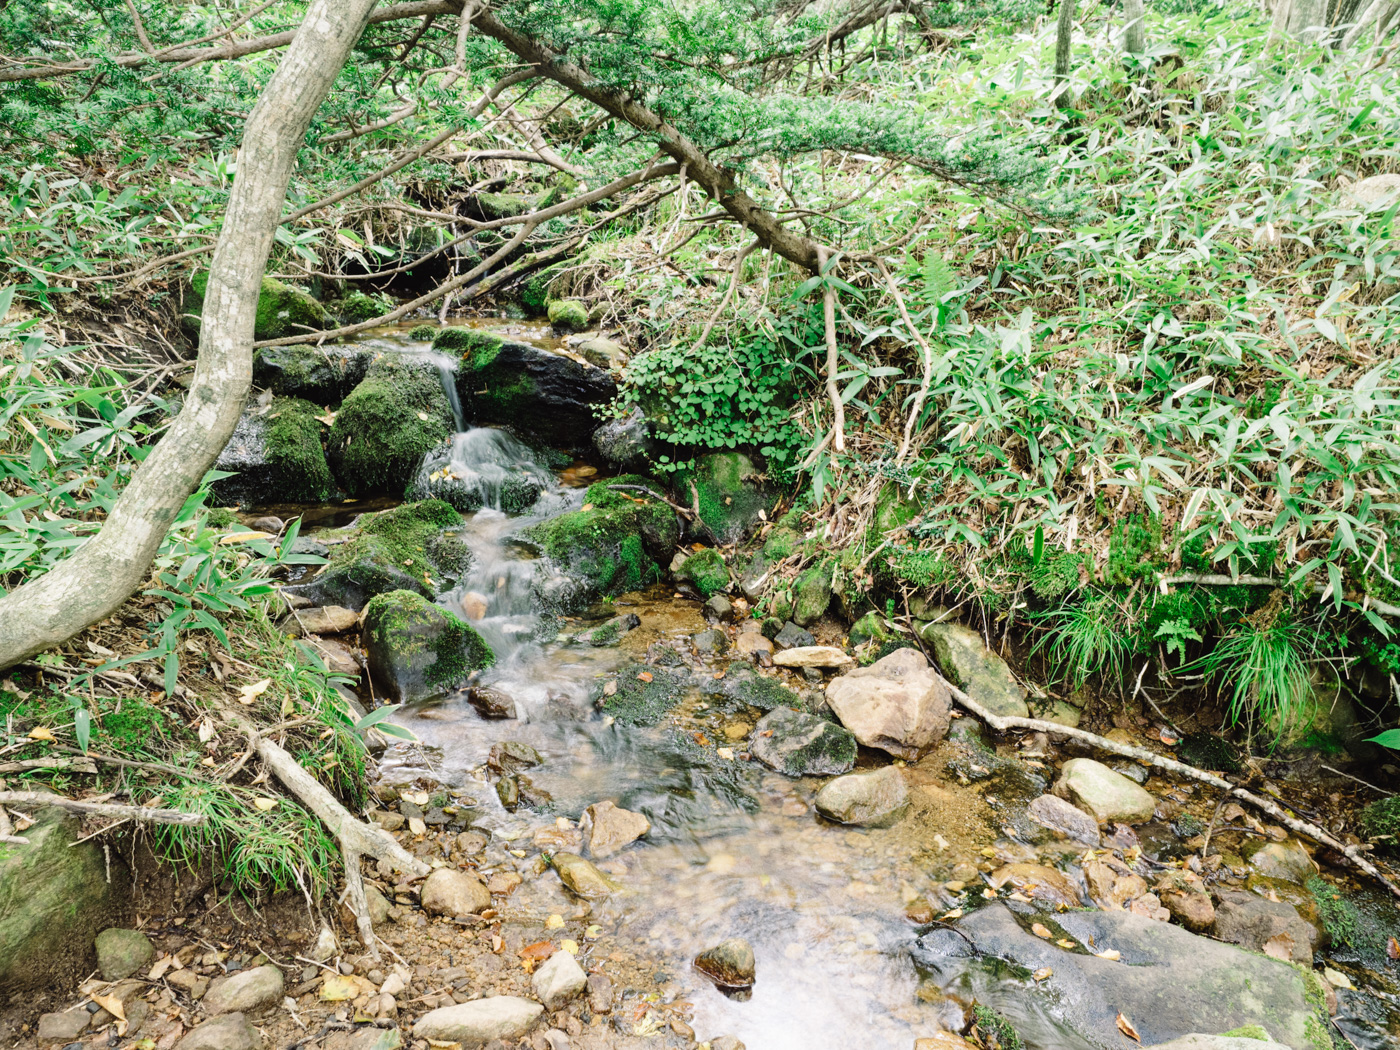 Korea - Mt Hallasan - Tiny stream